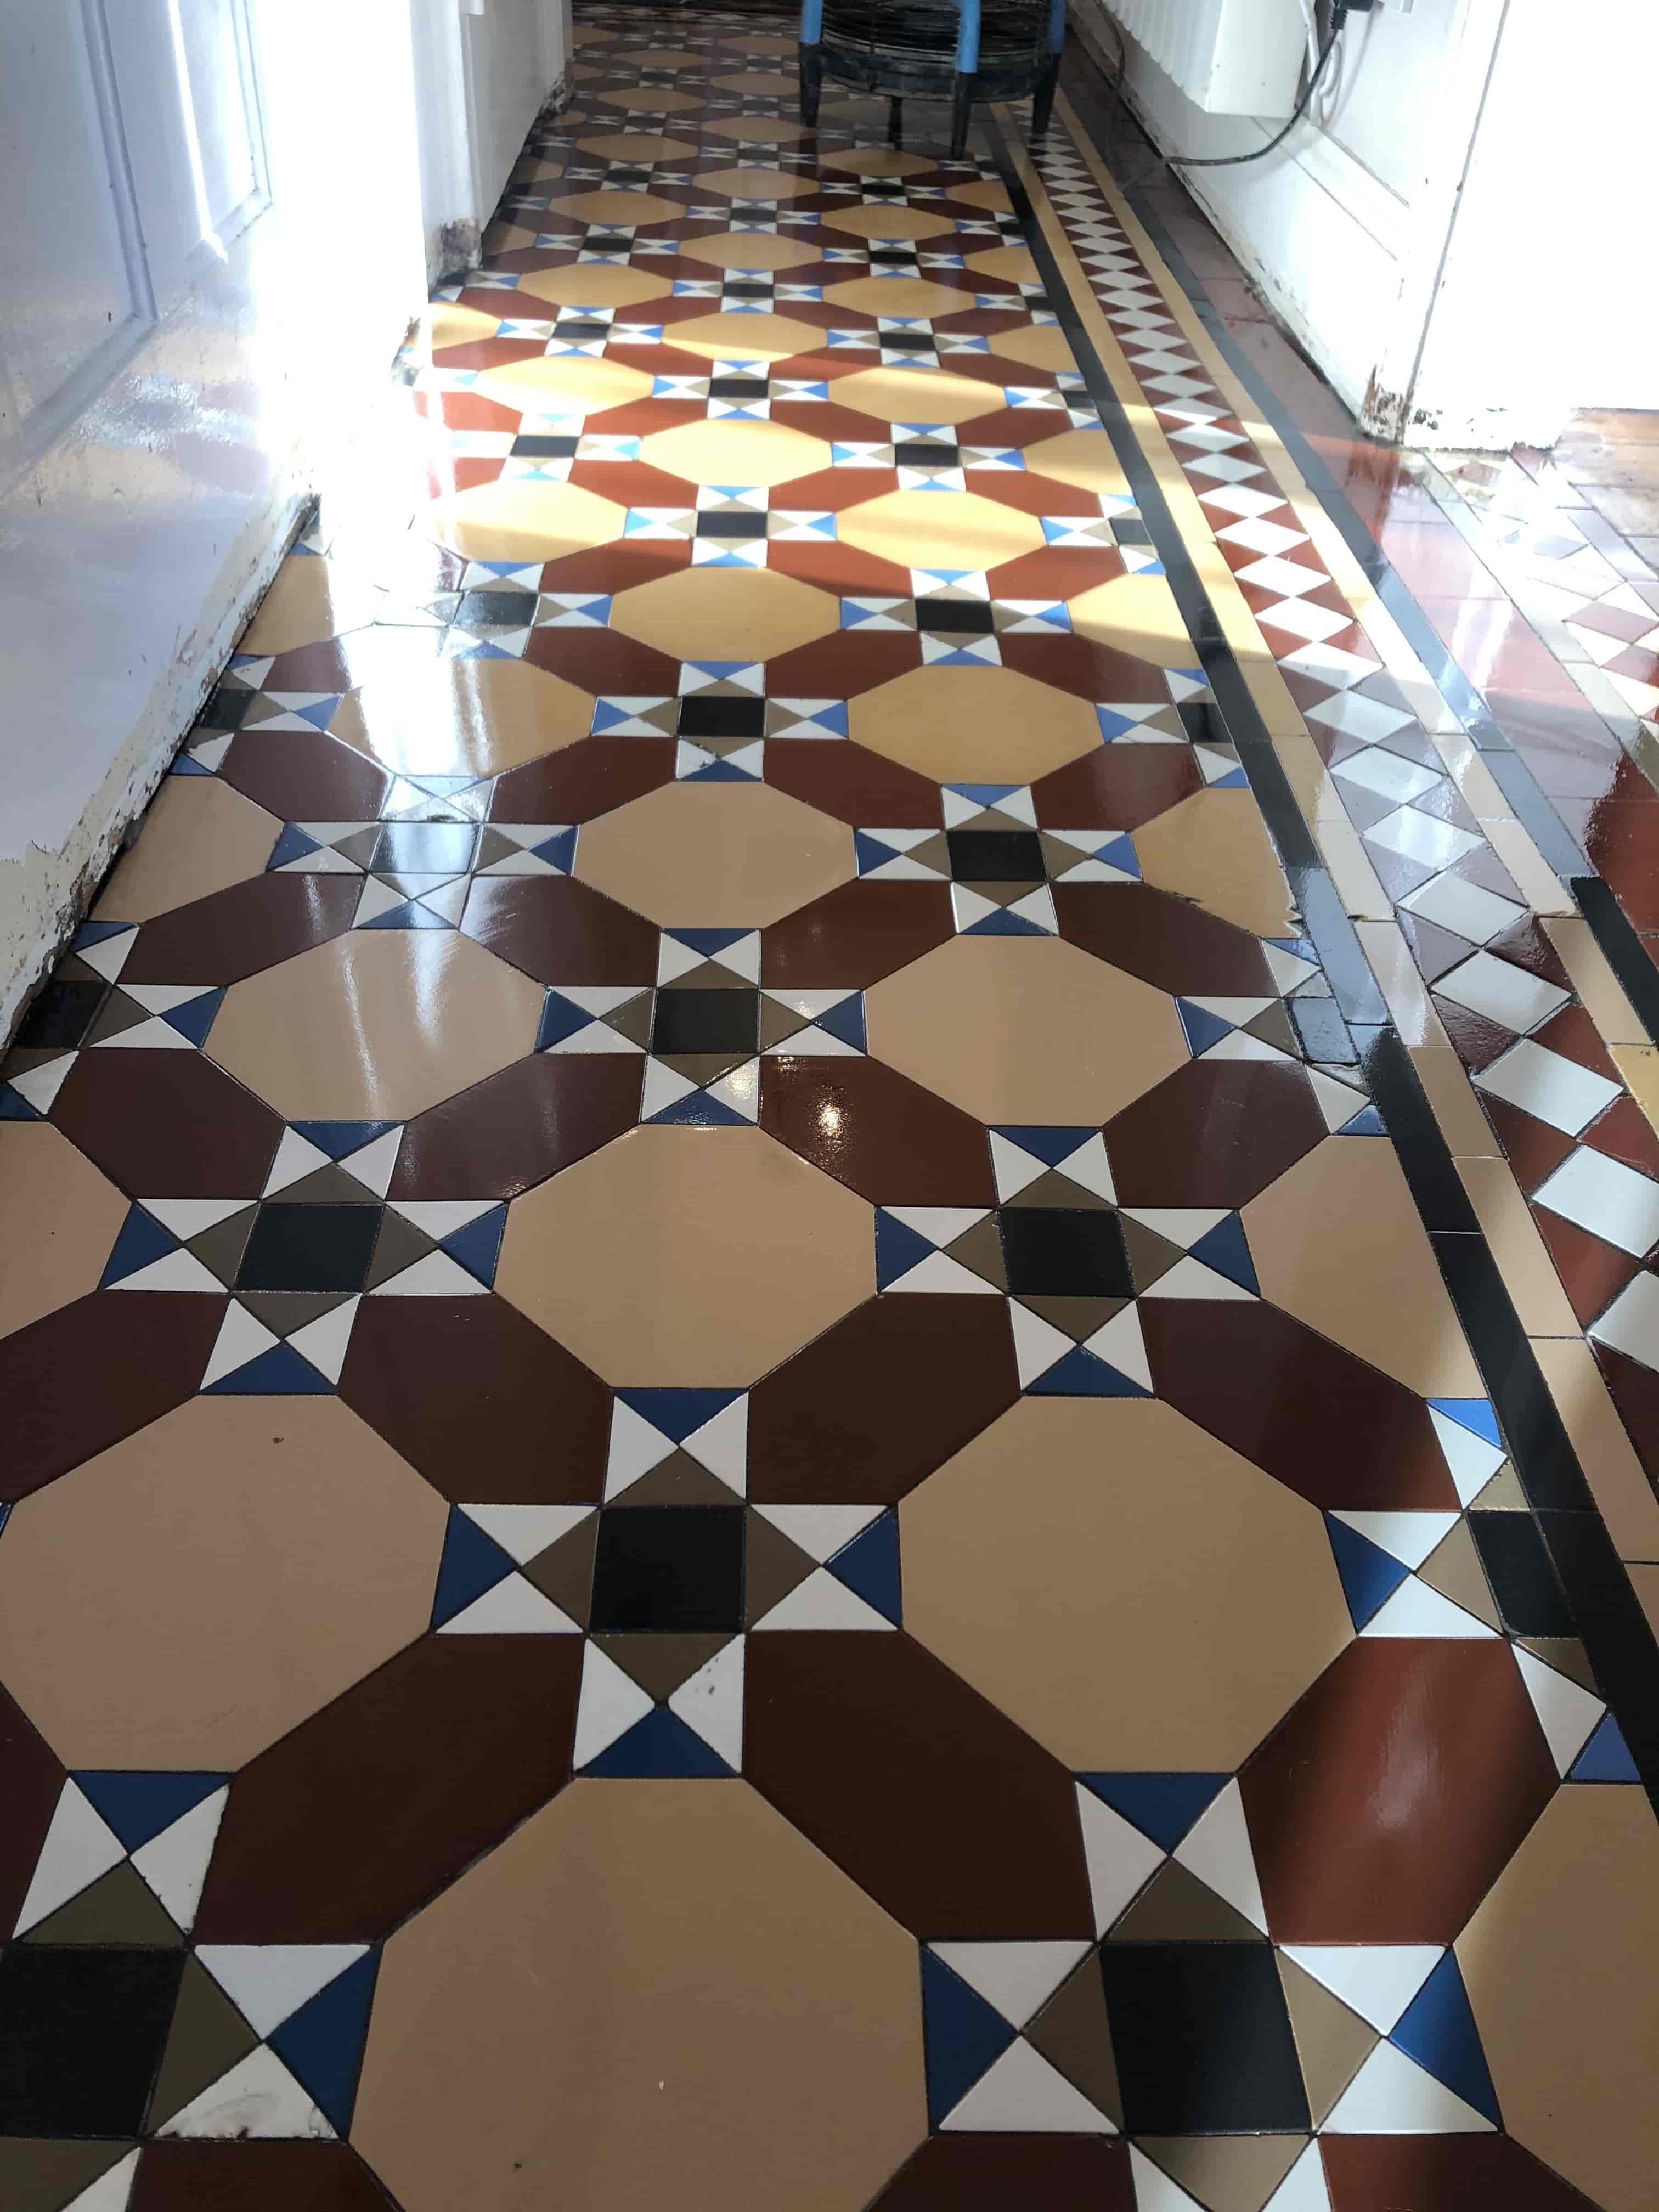 Victorian Hallway After Craven Dunnill Tile Rebuild Stoke Golding Nuneaton